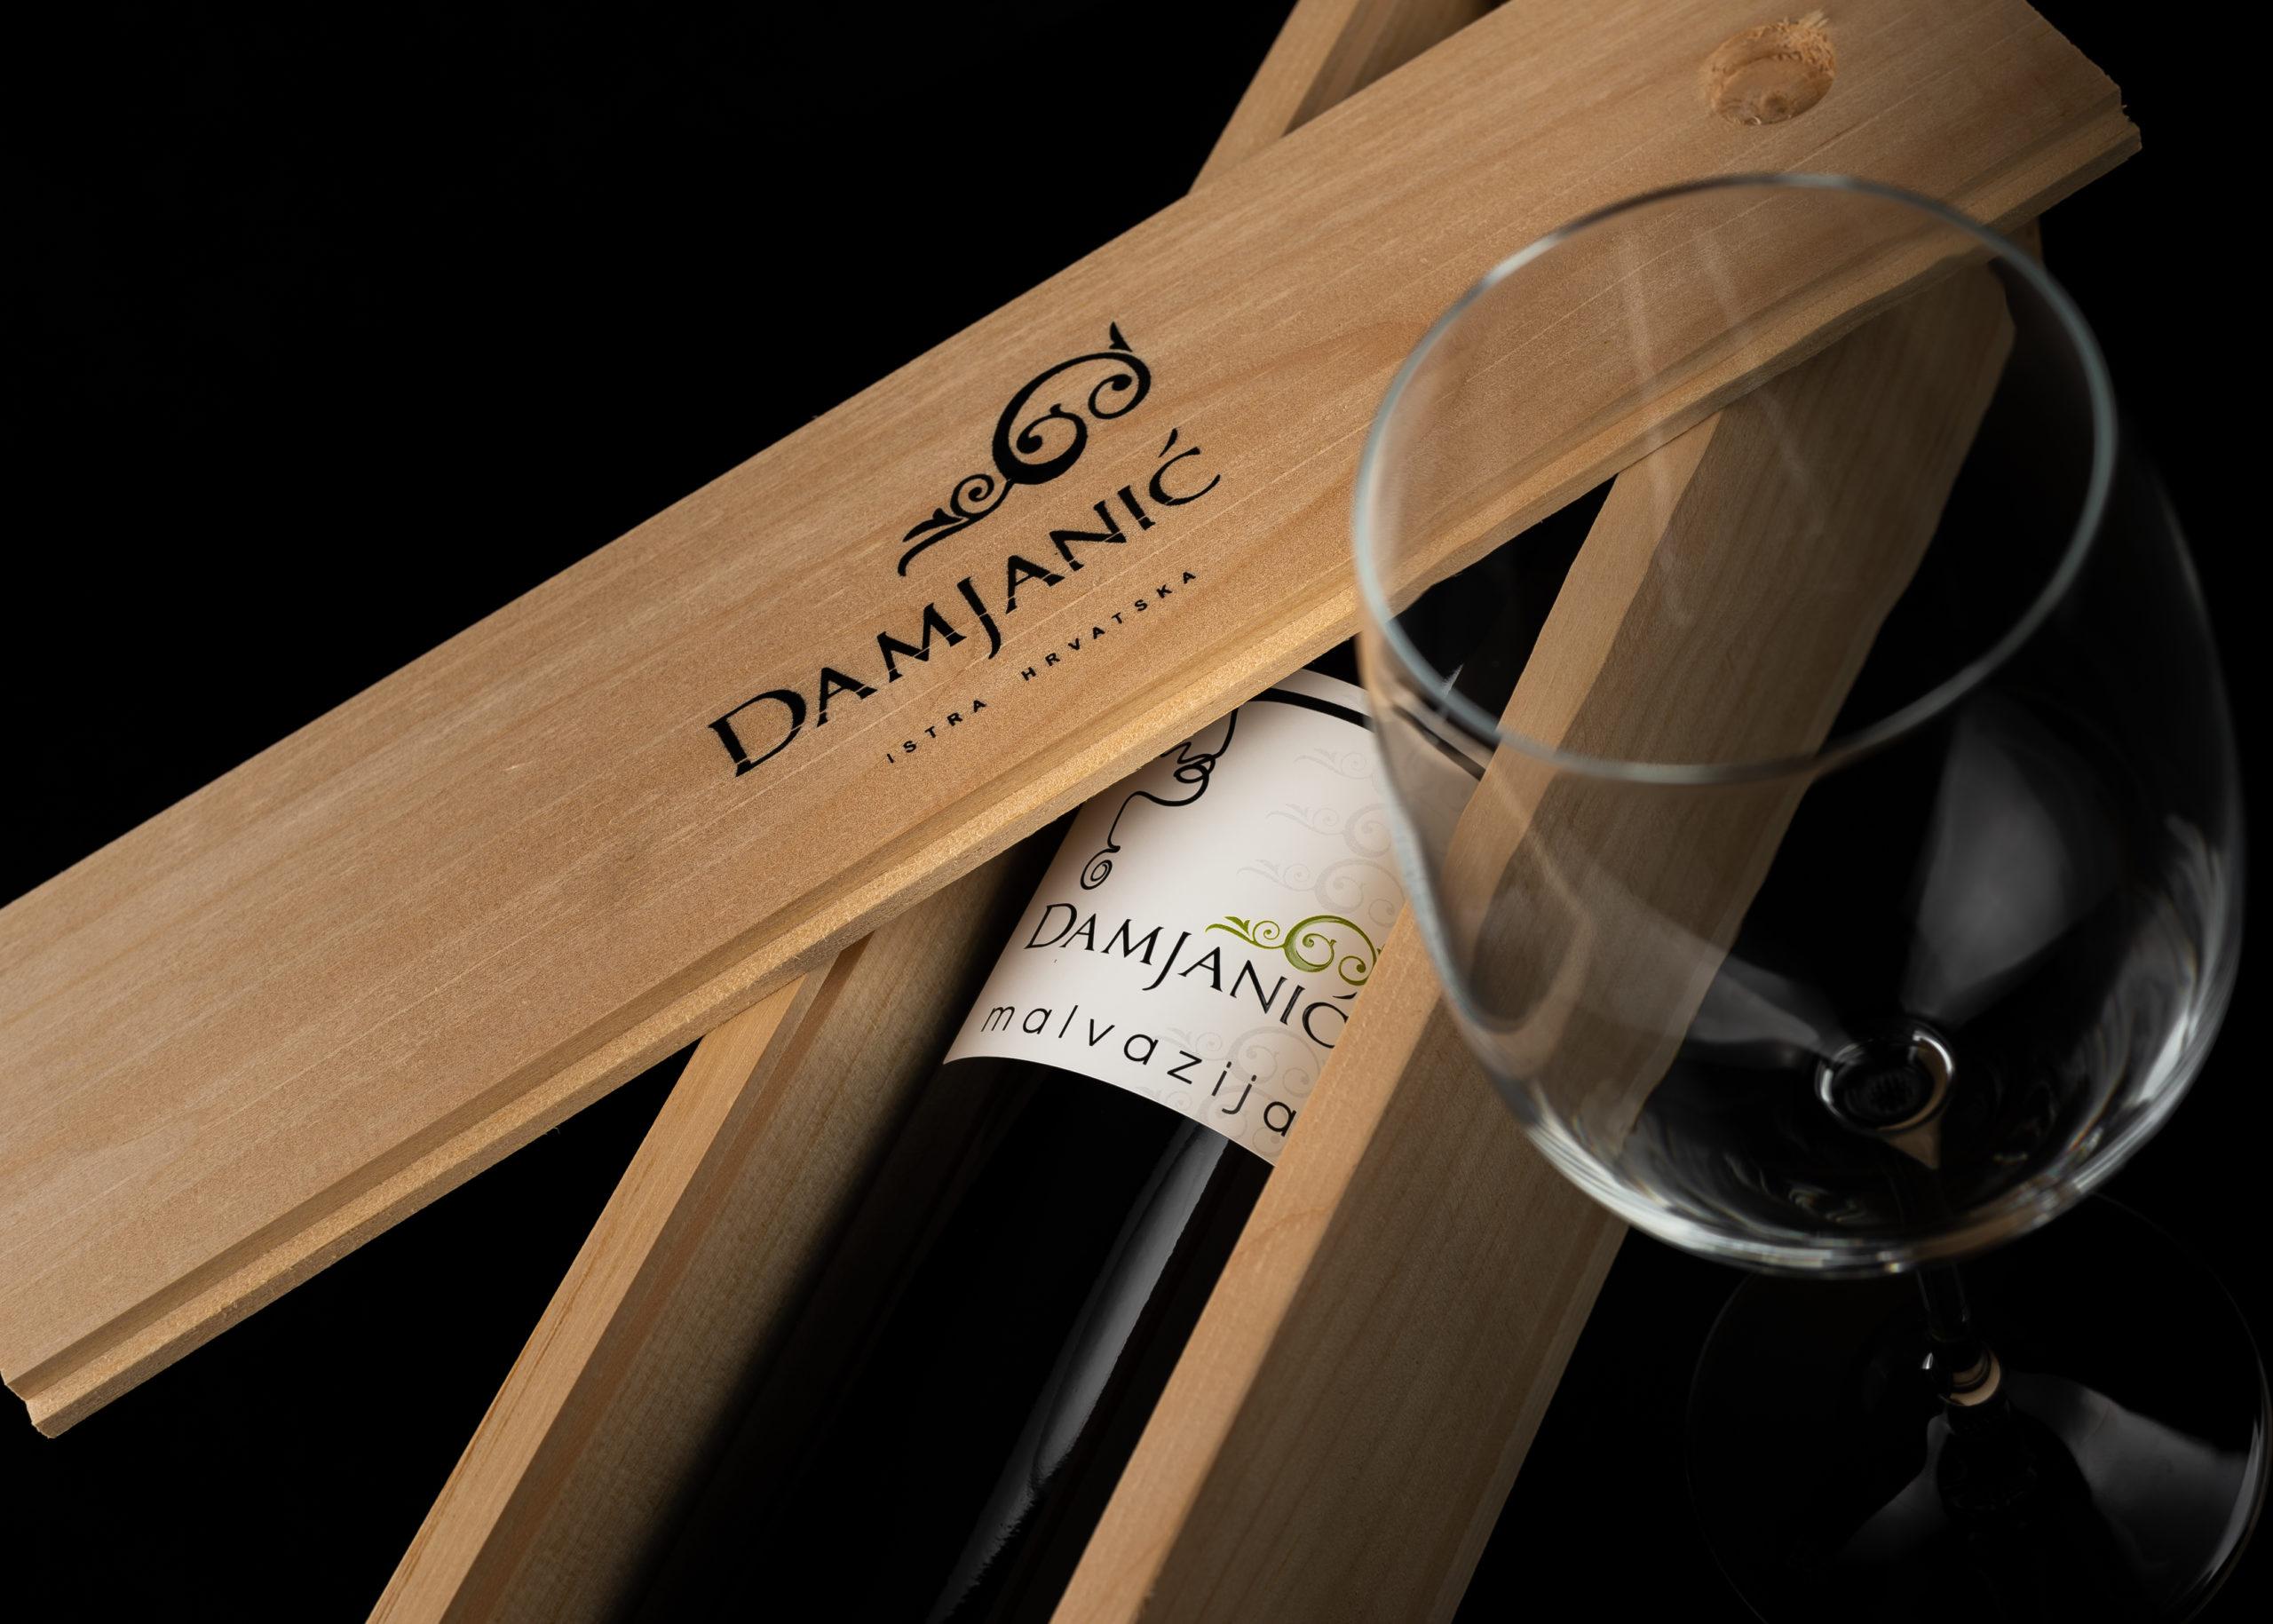 hren | plethora of creativity // Damjanić winery product photography